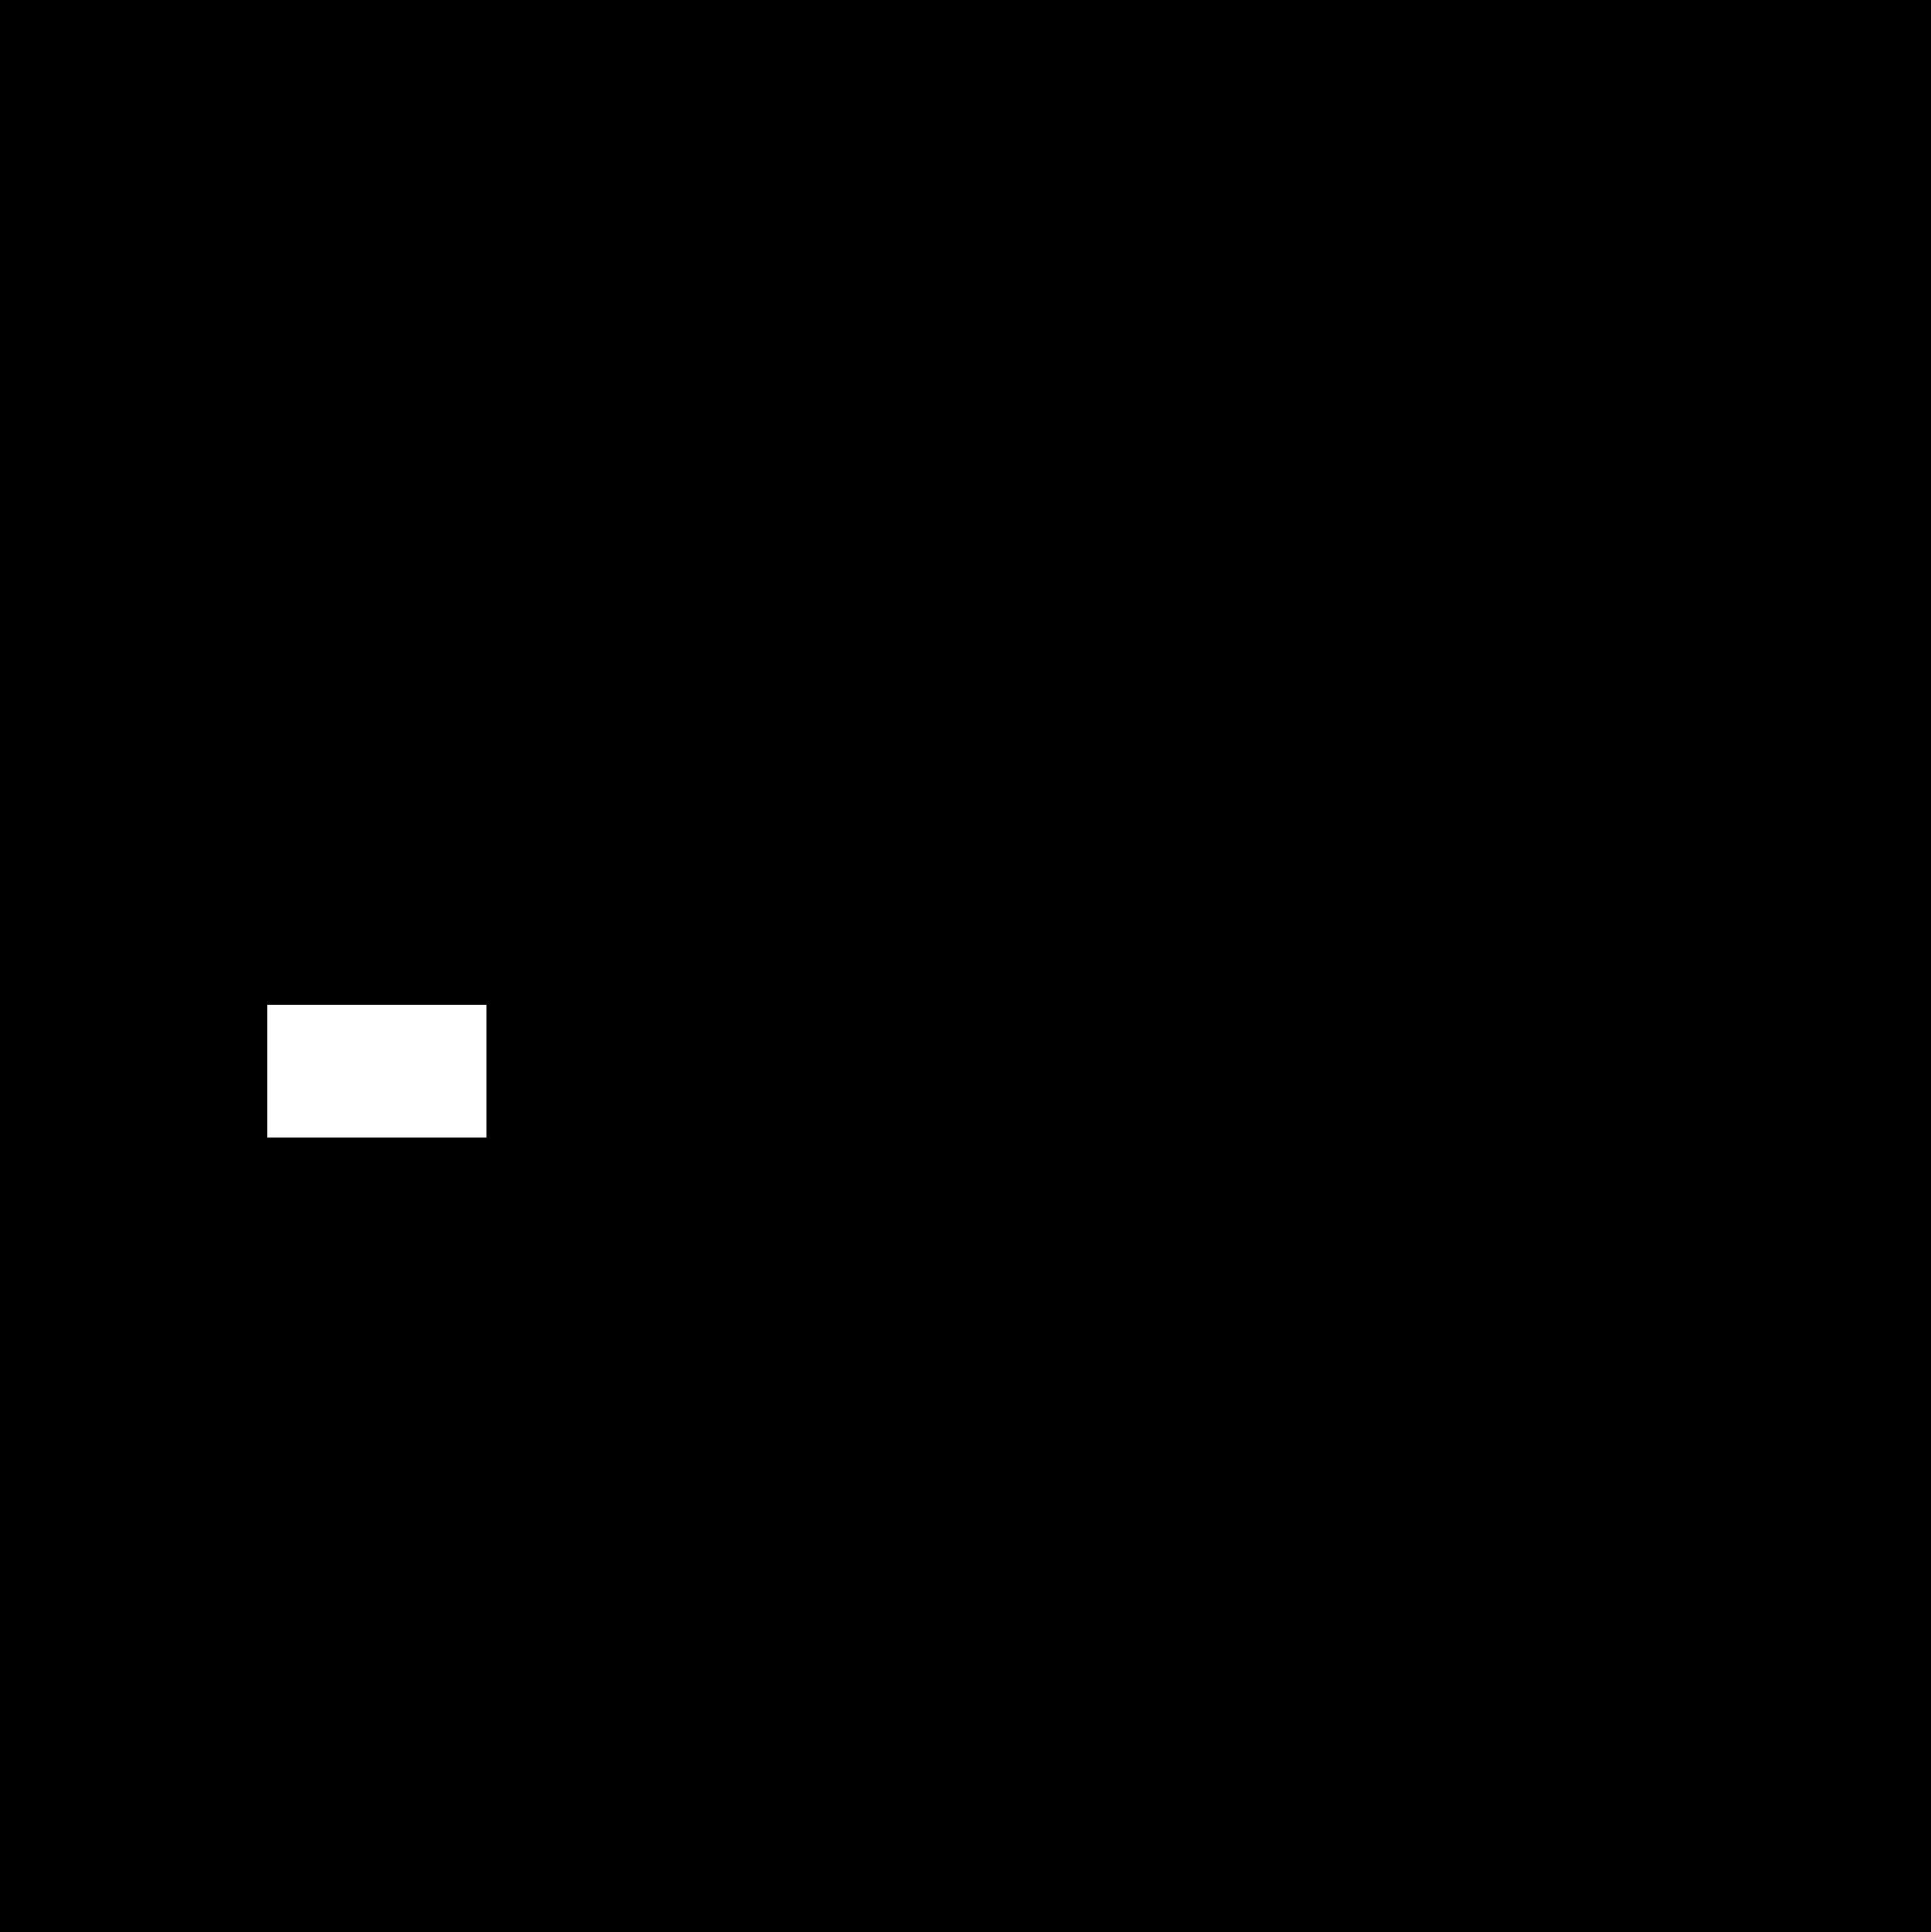 Logo Noir Jugand